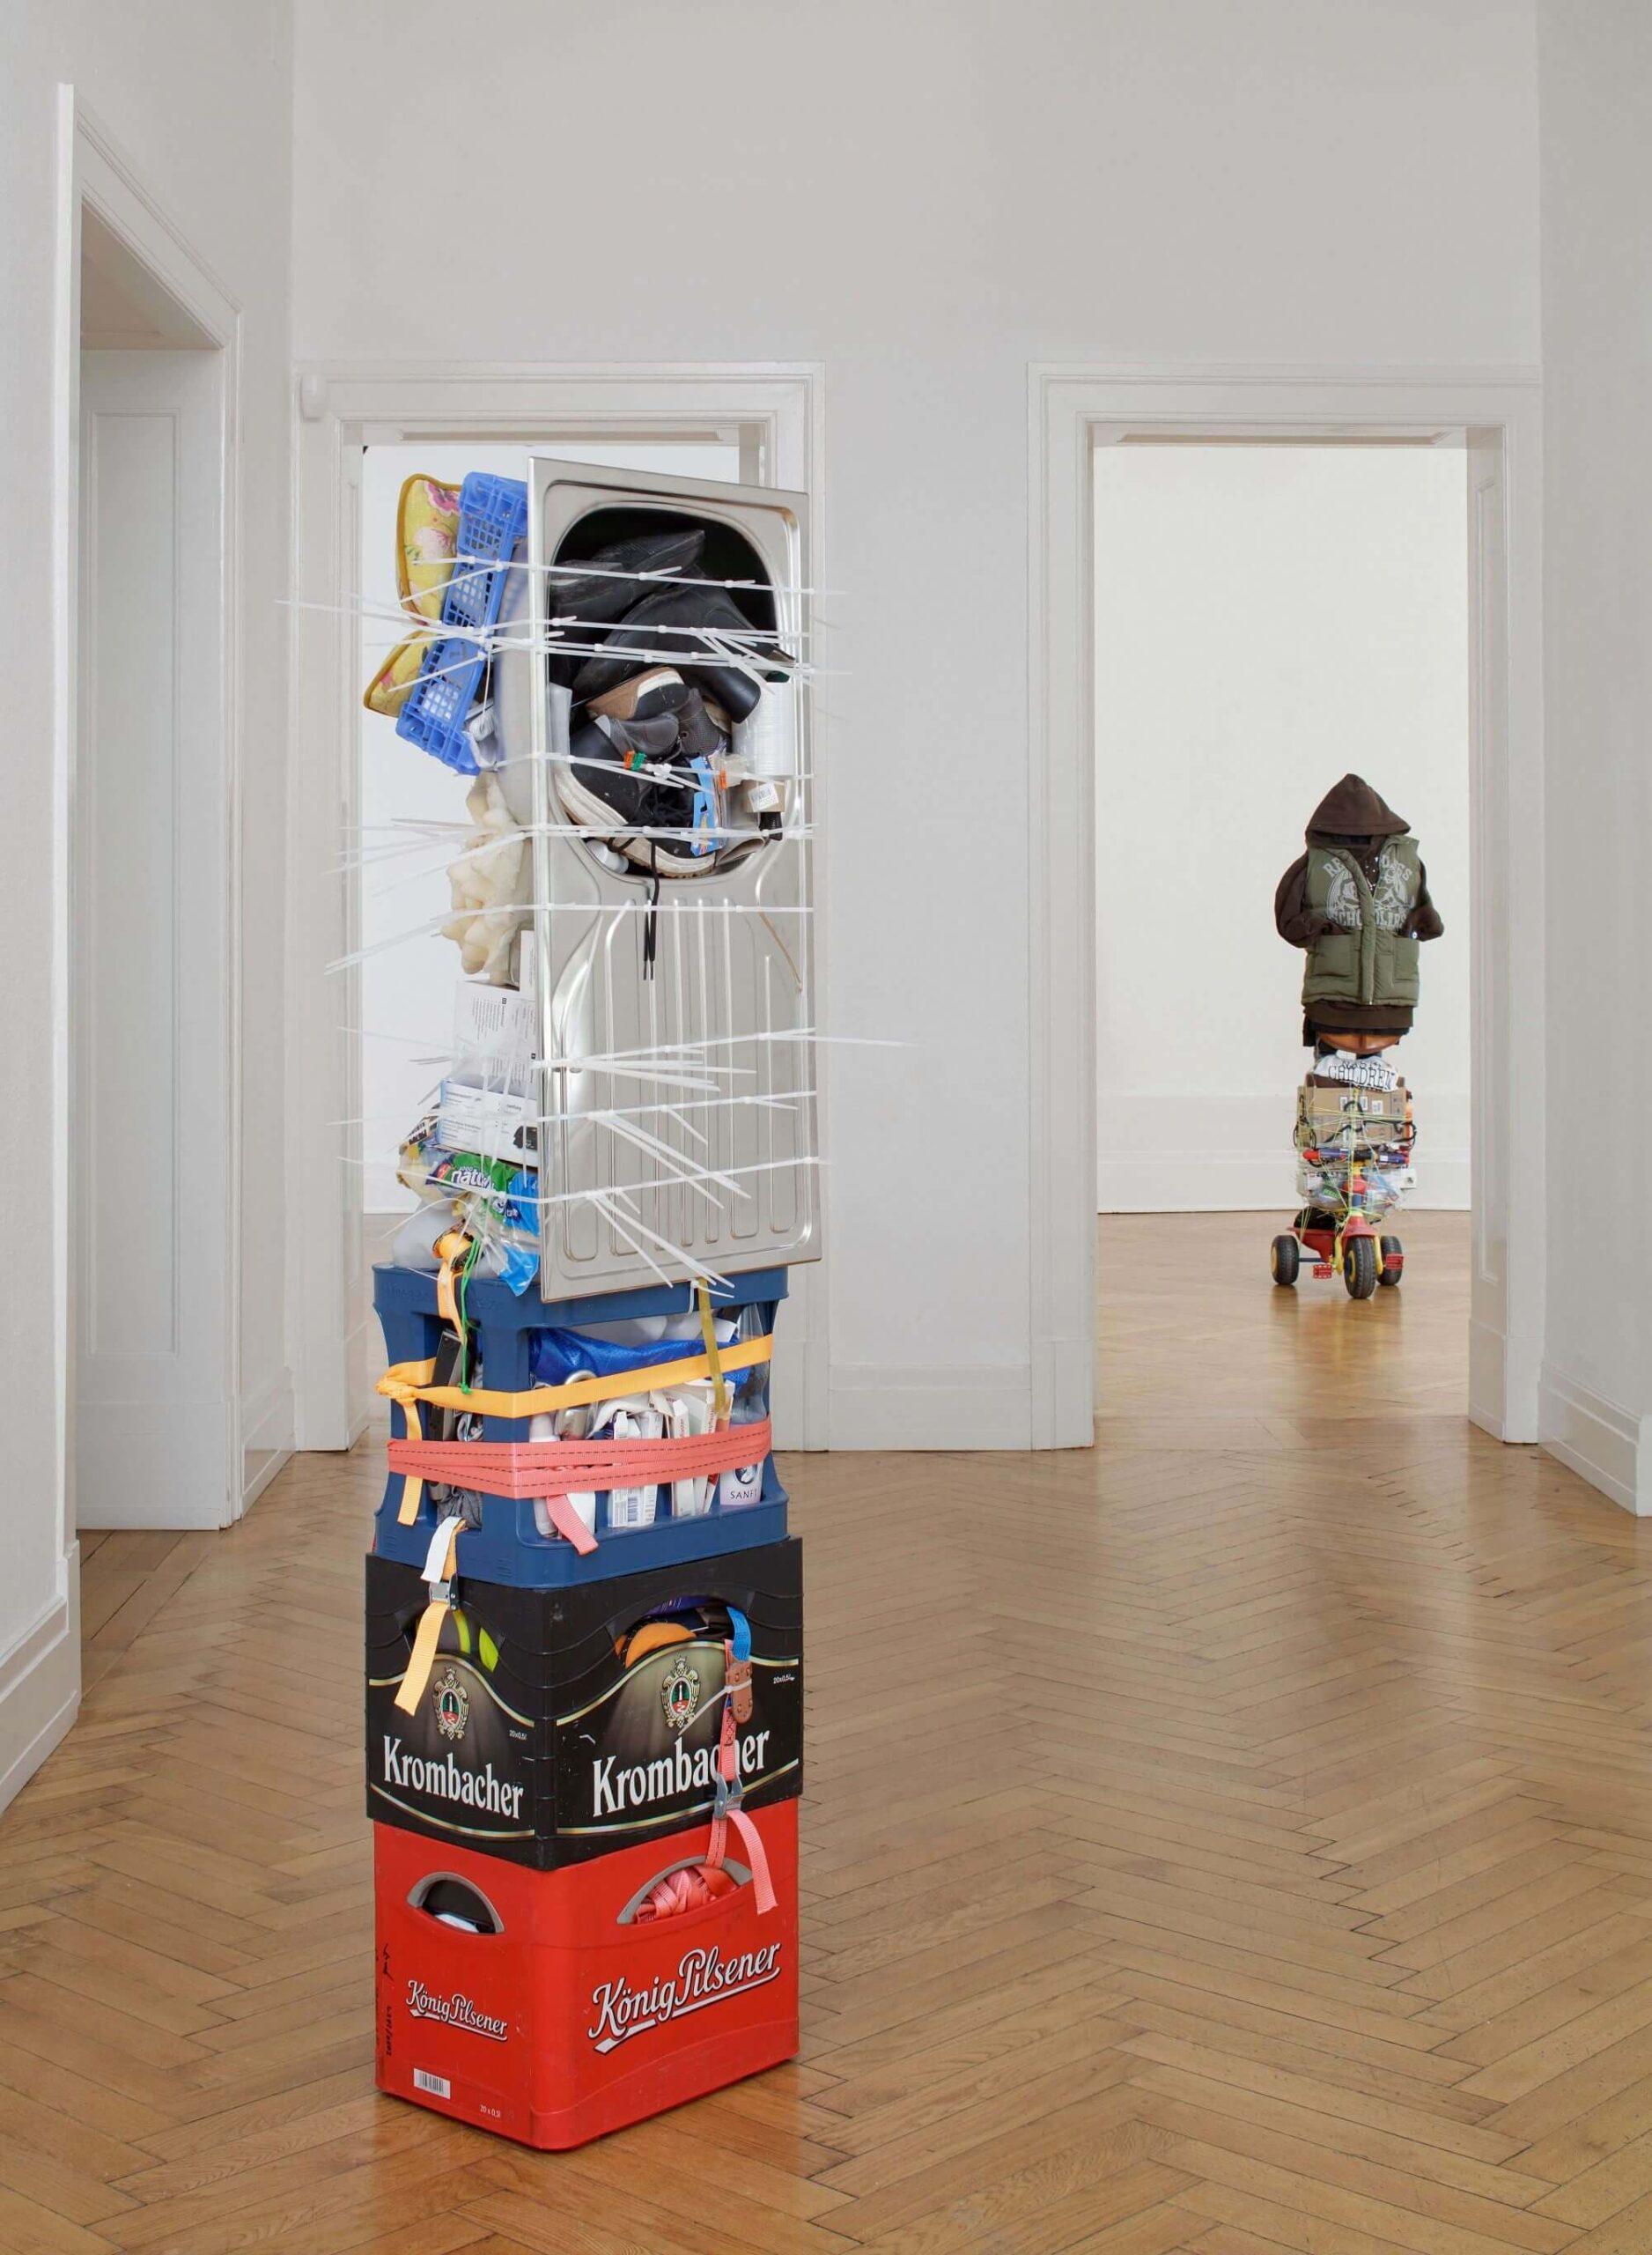 Umut Yasat: 32/7+, GNYP Gallery